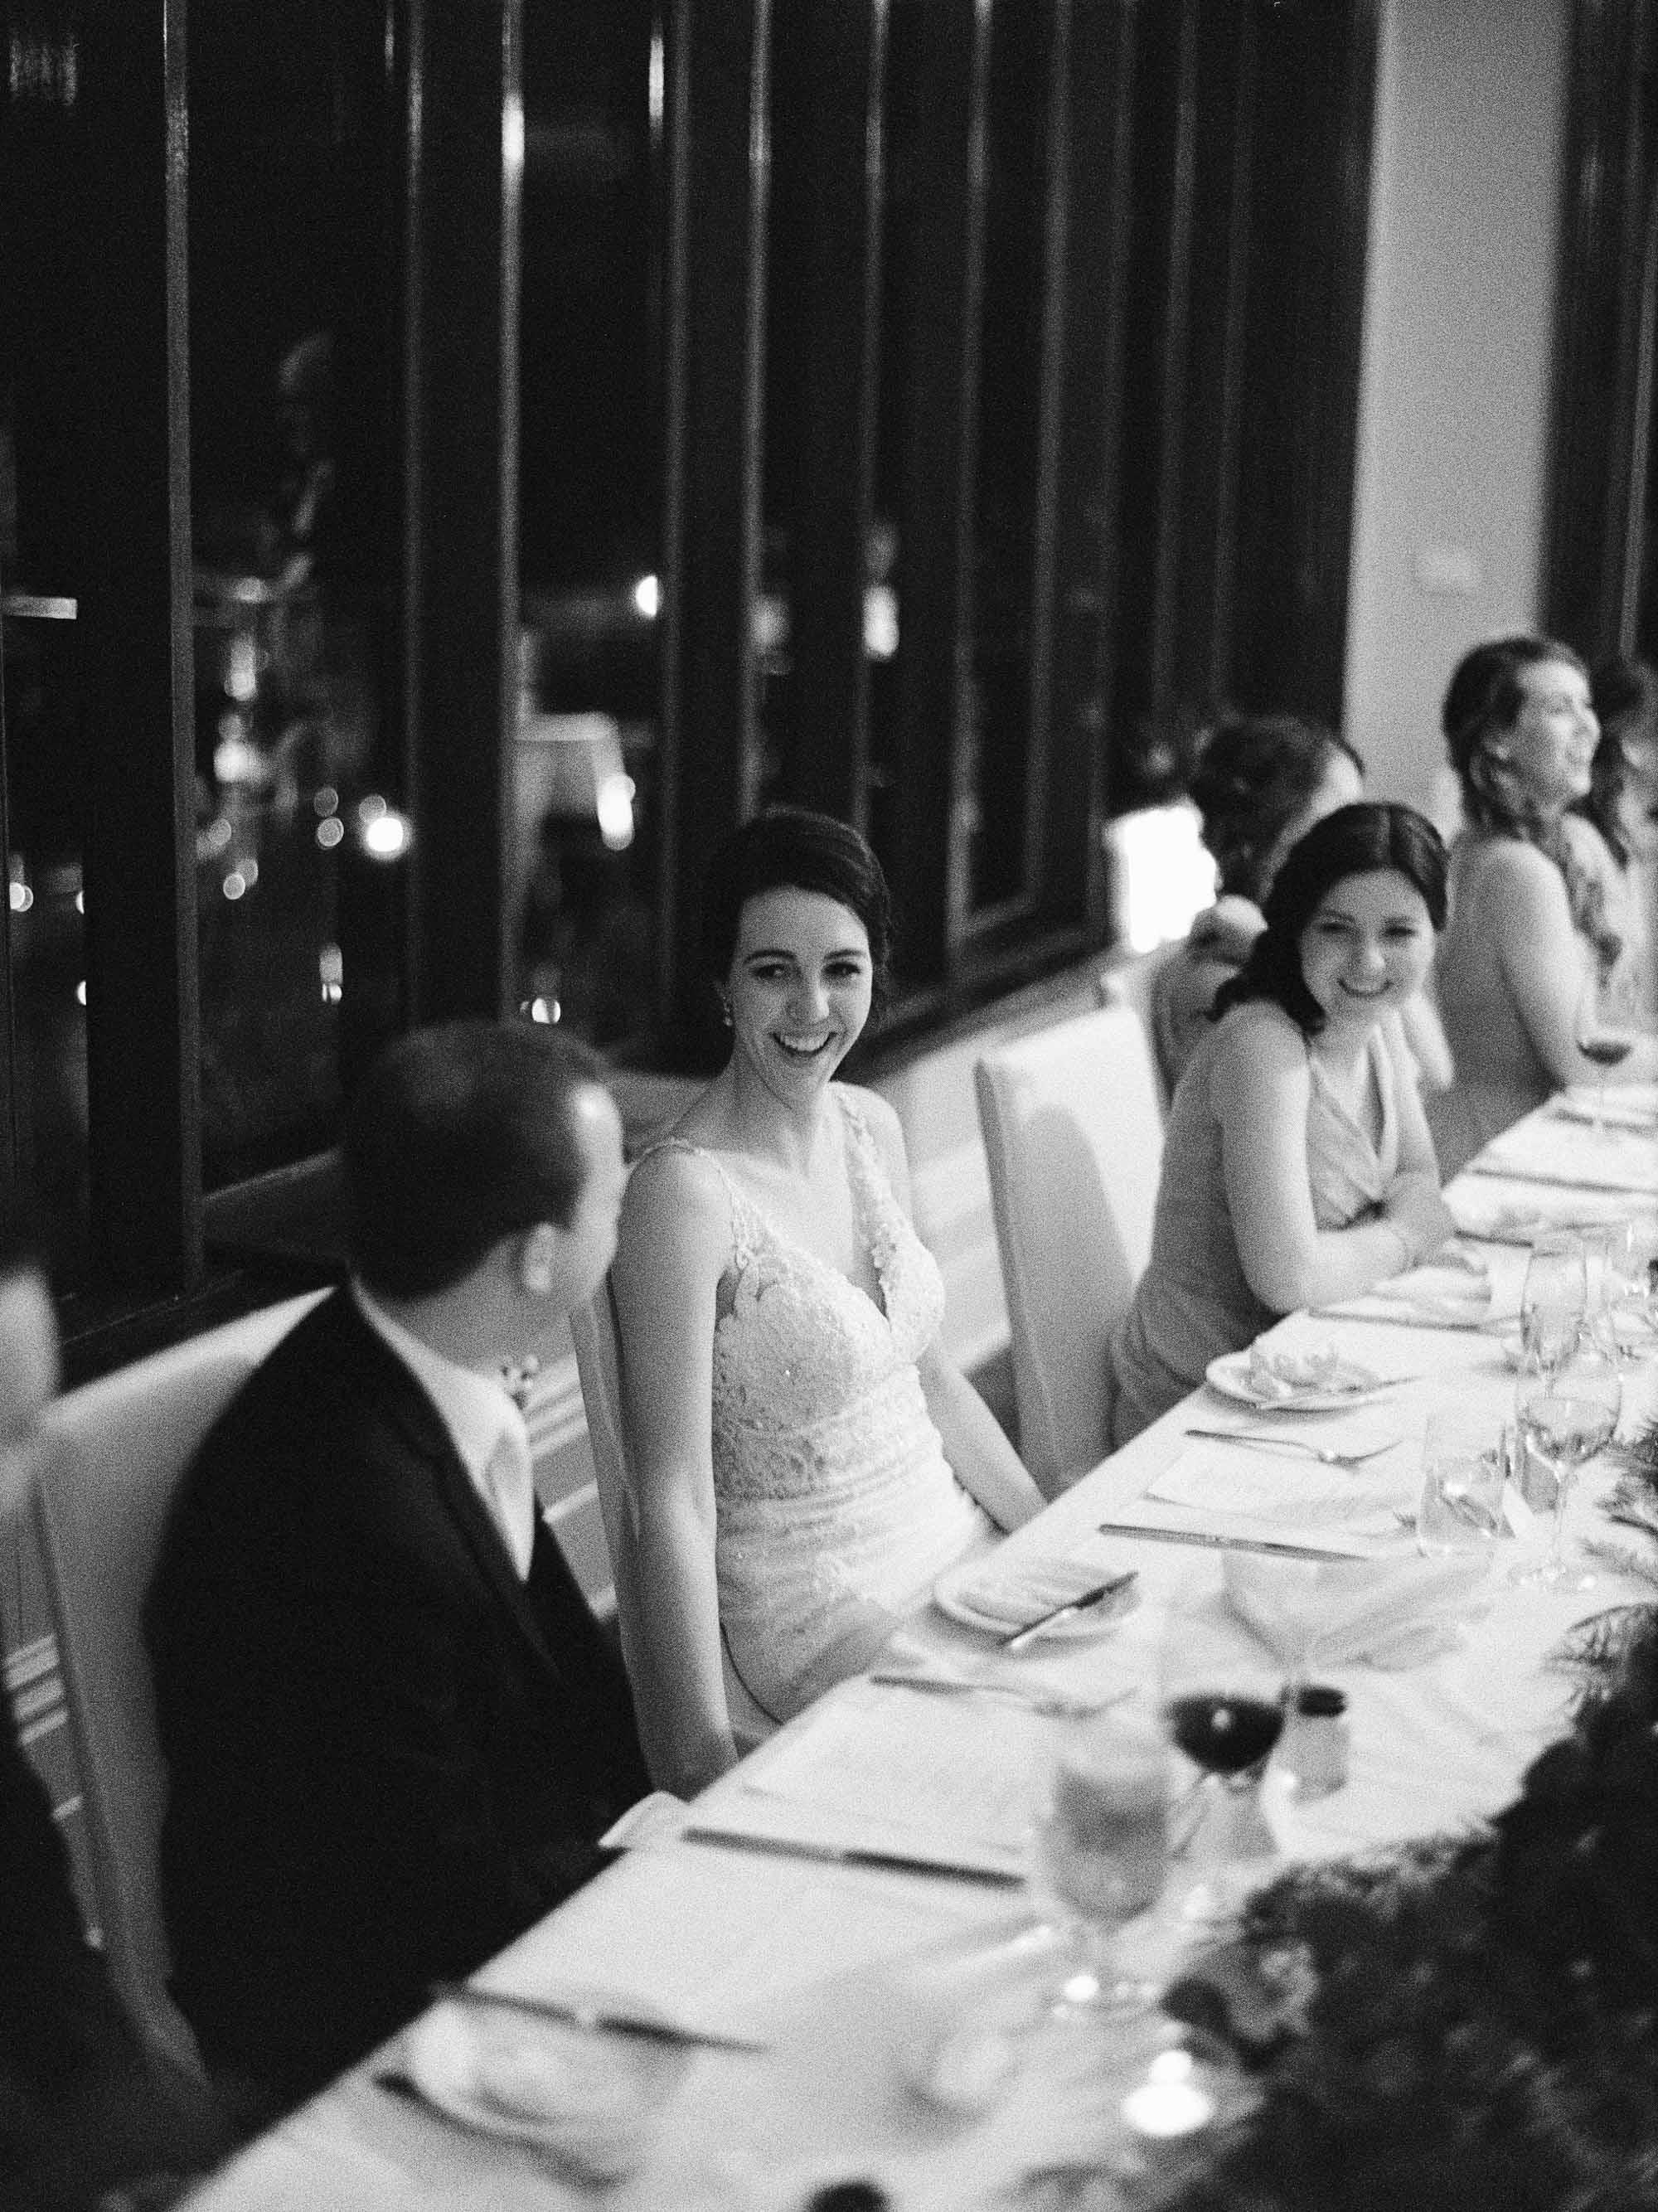 Mount-Lofty-House-wedding-photography-093.jpg